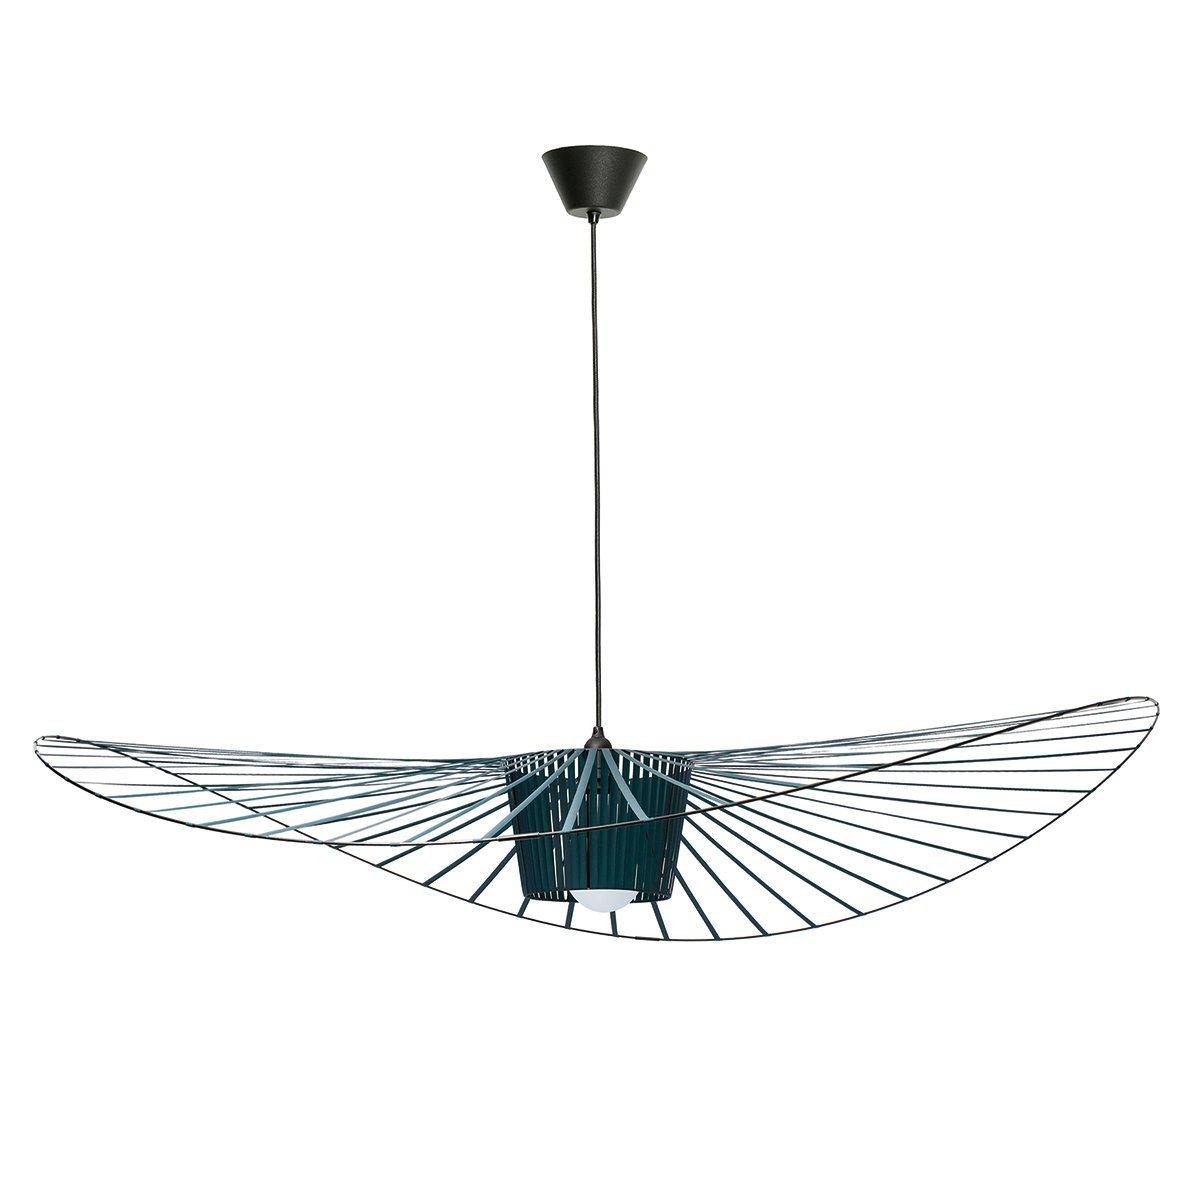 Petite Friture Vertigo Hanglamp - Small - Groen